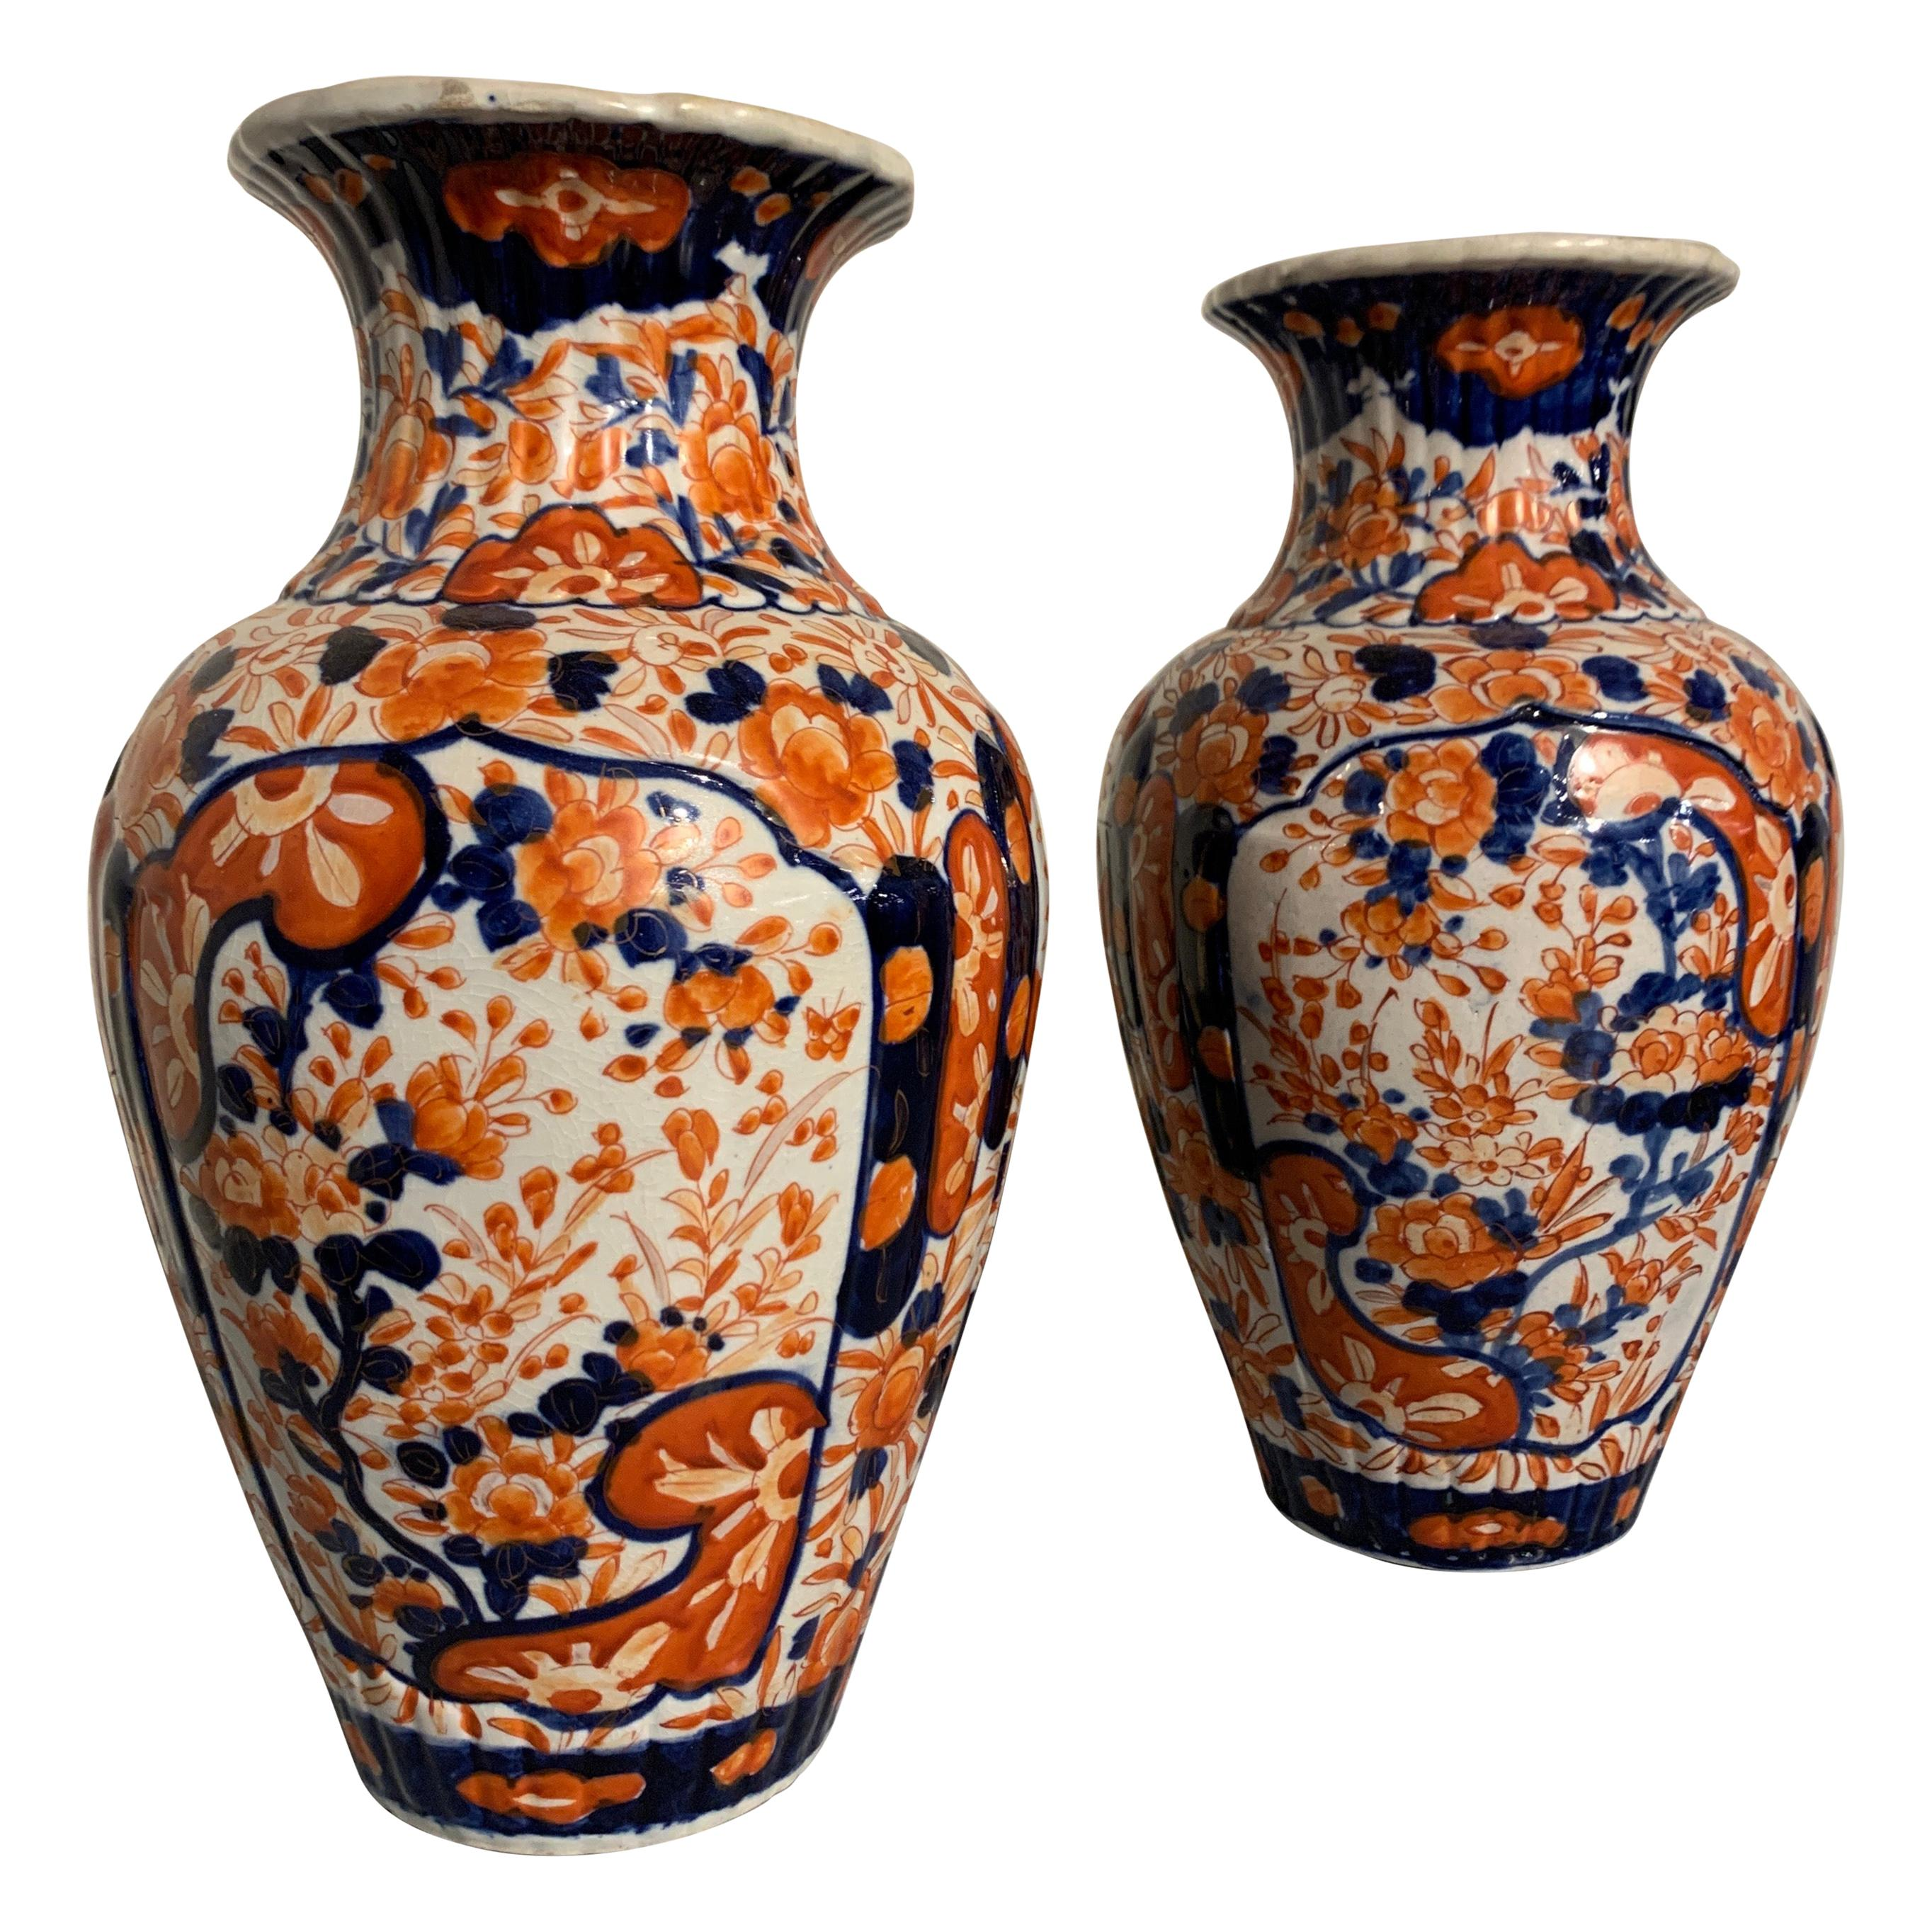 Pair of Japanese Imari Ribbed Vases, Meiji Period, circa 1900